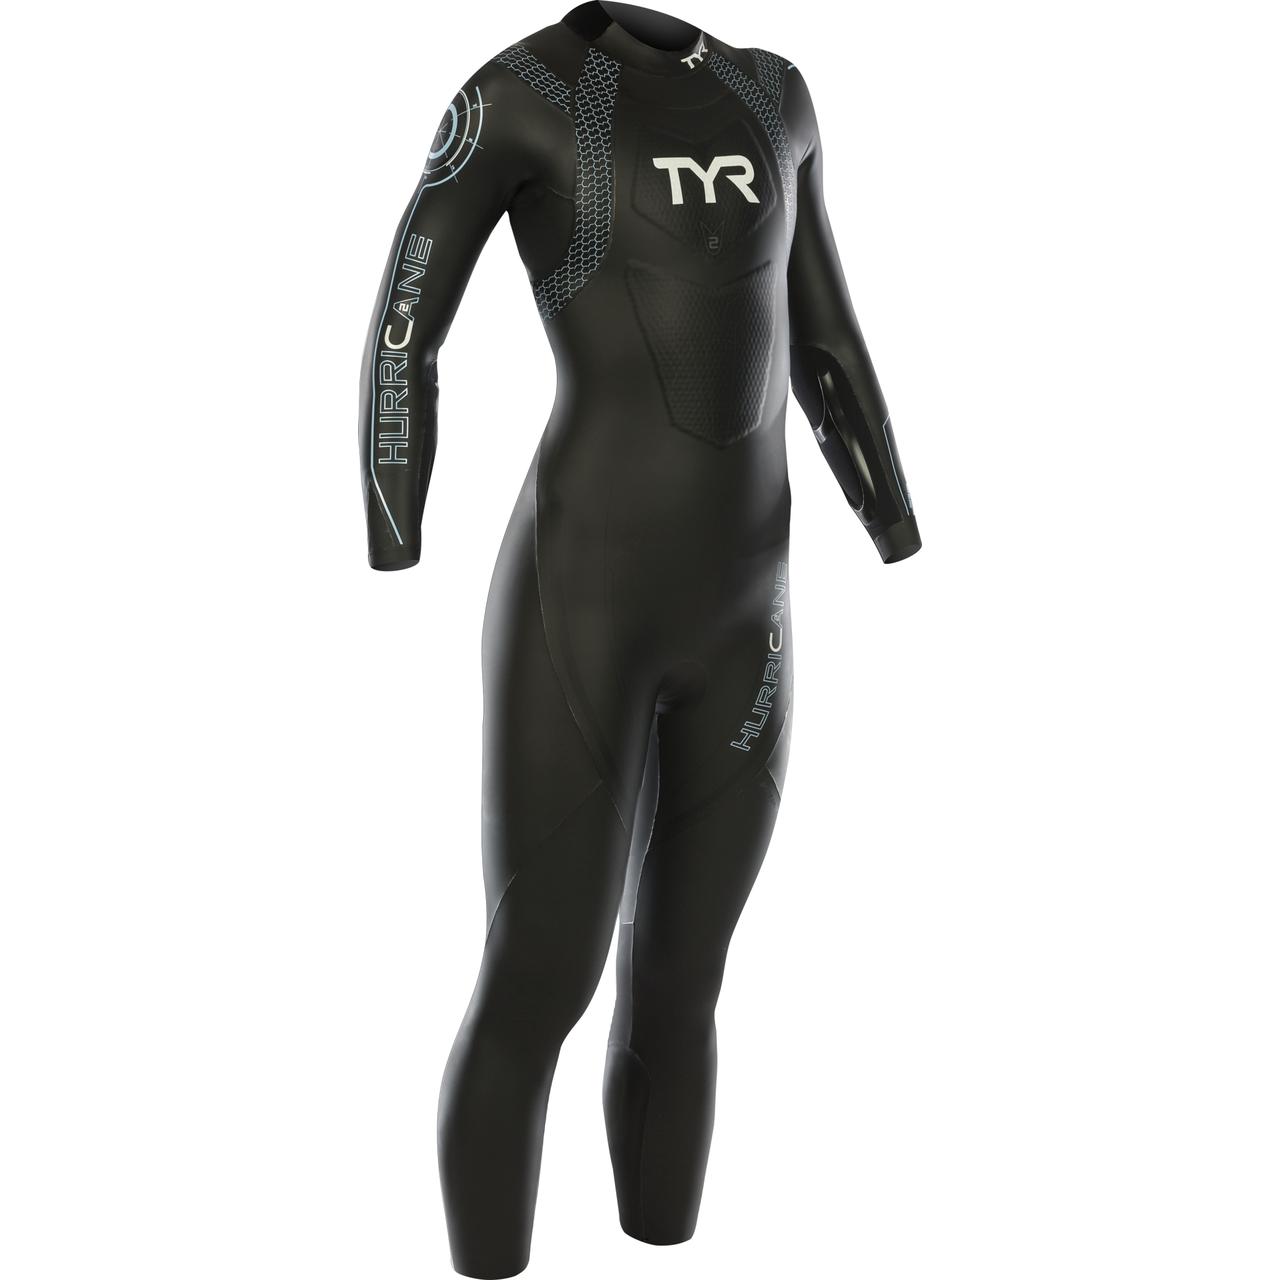 TYR Women's Hurricane Category 2 Full Sleeve Wetsuit - 2019 price